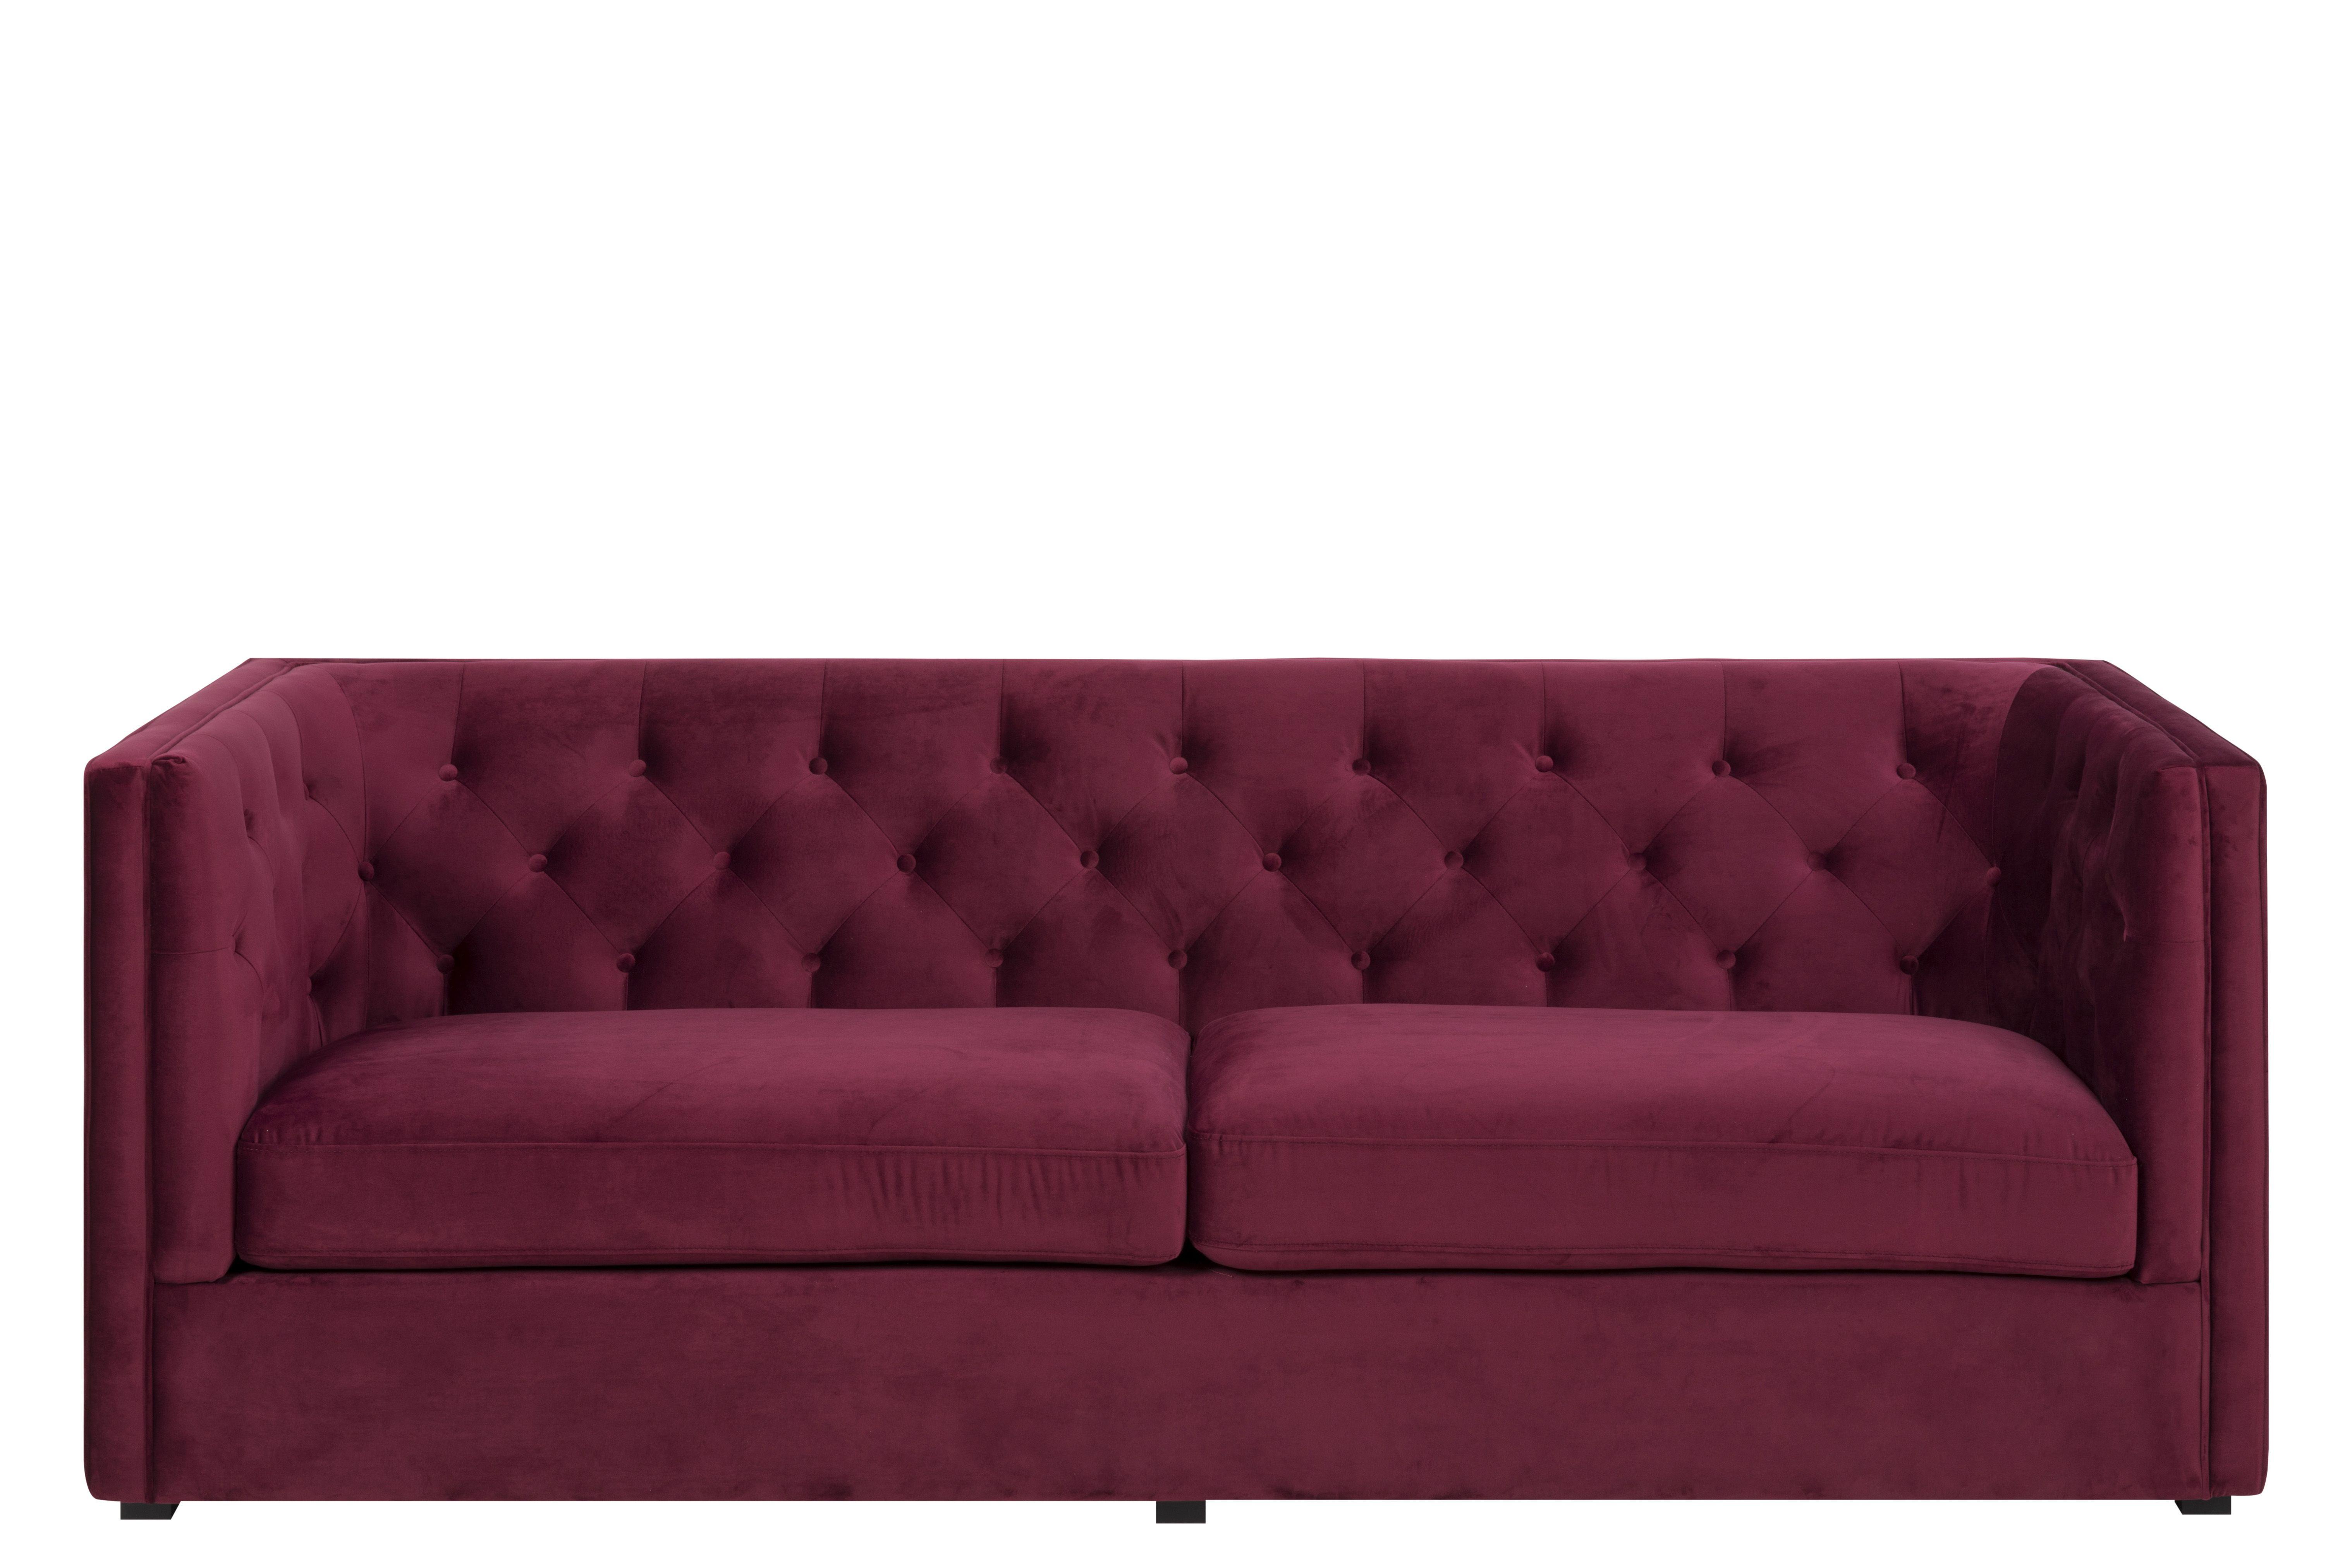 A Scandinavian classic the Kamma sofa exudes Danish design